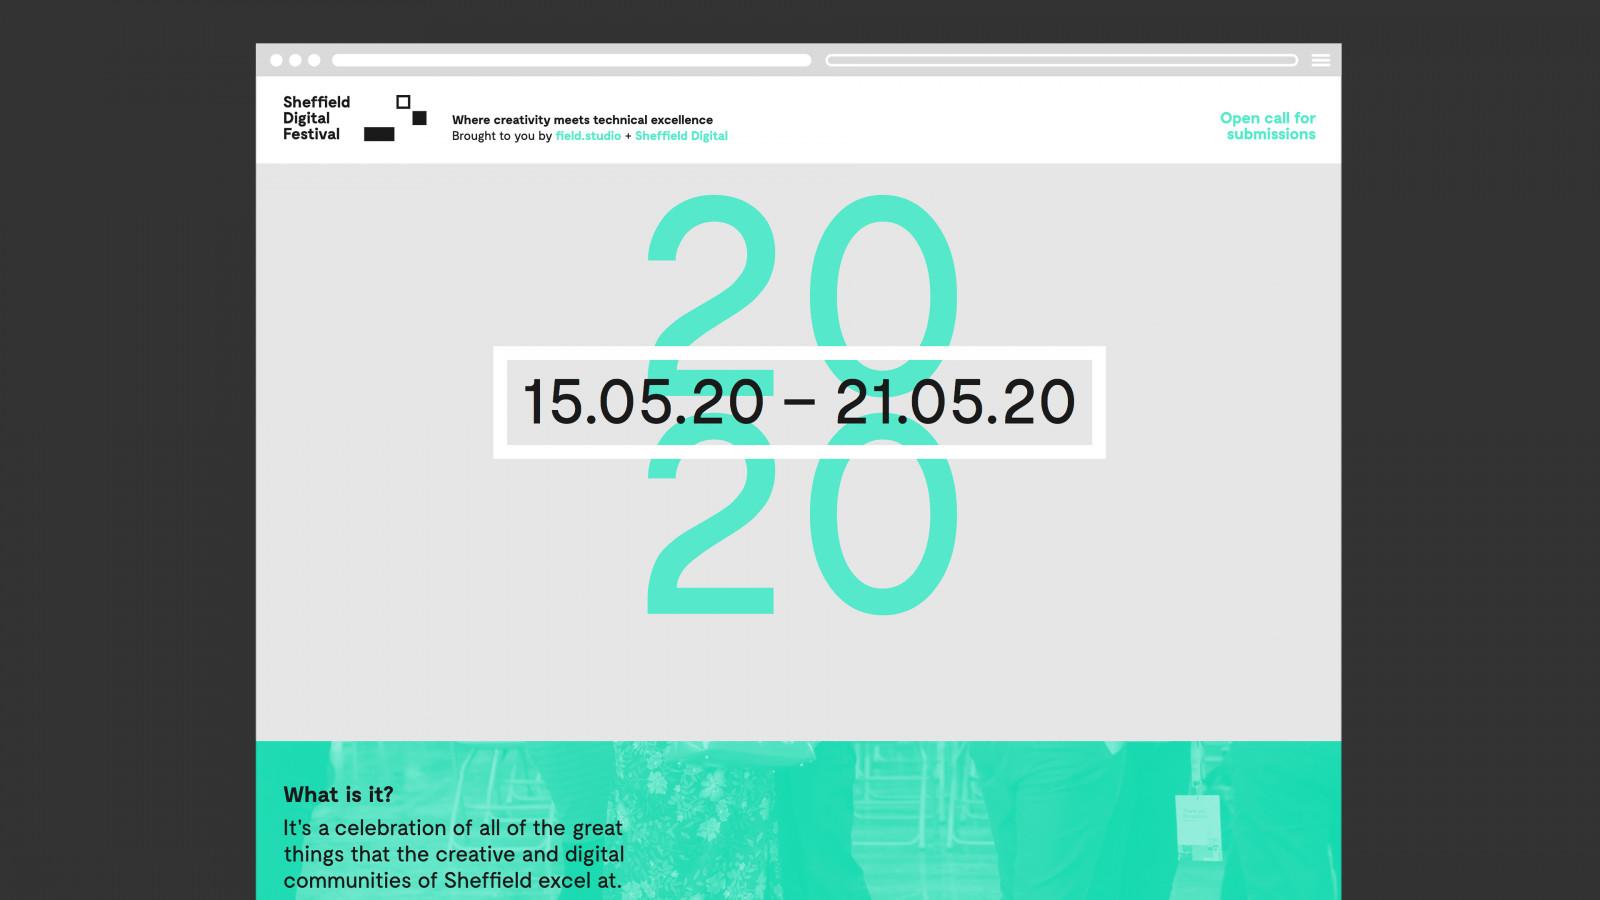 Sheffield Digital Festival 2020 Site Image -  image for Sheffield Digital Festival project